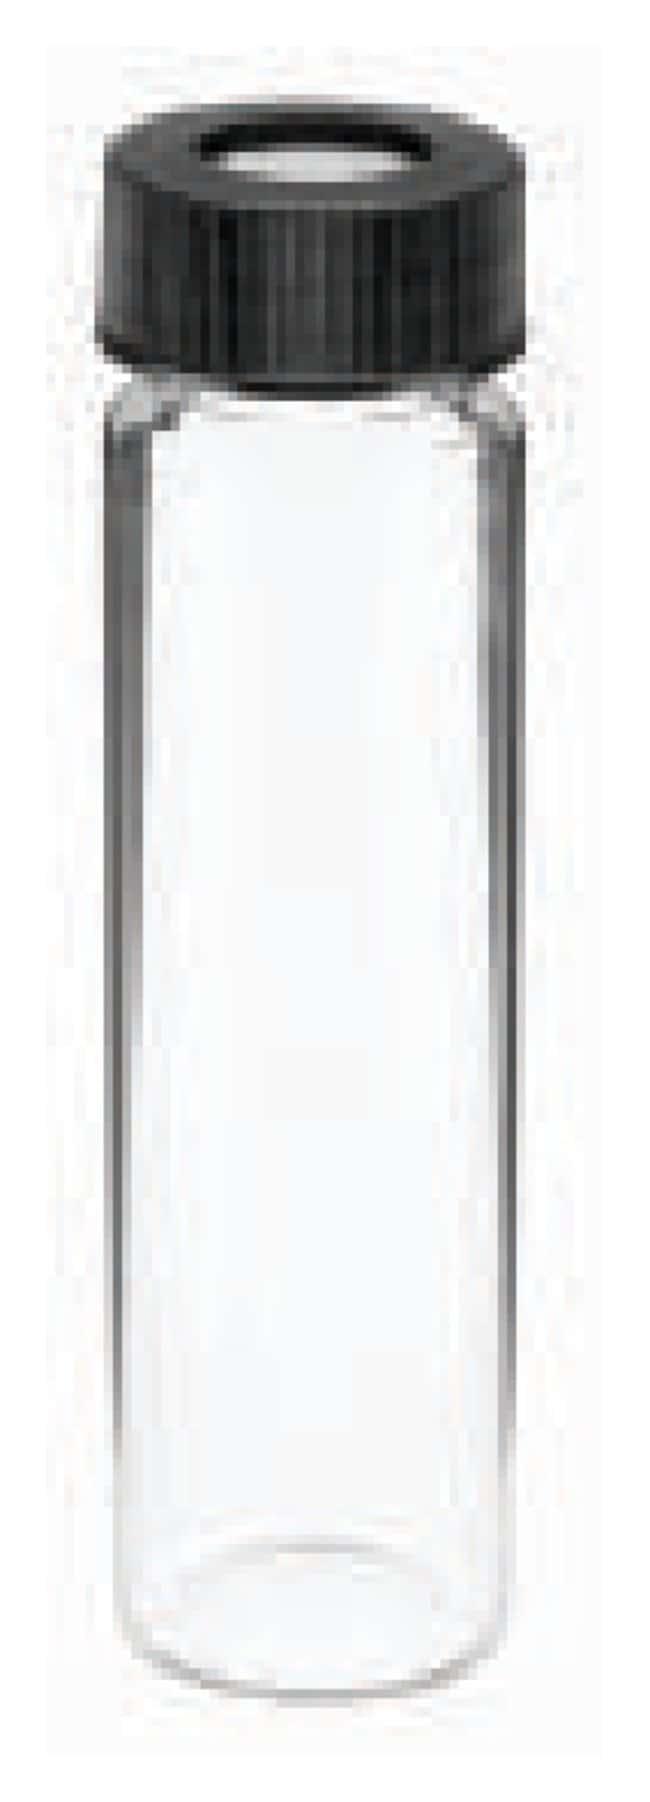 DWK Life SciencesKimble™ Glass Screw-Thread Sample Vials with PTFE/Silicone Septa and Open-Top Polypropylene Closure Glass; GPI 18-400, 16mL DWK Life SciencesKimble™ Glass Screw-Thread Sample Vials with PTFE/Silicone Septa and Open-Top Polypropylene Closure